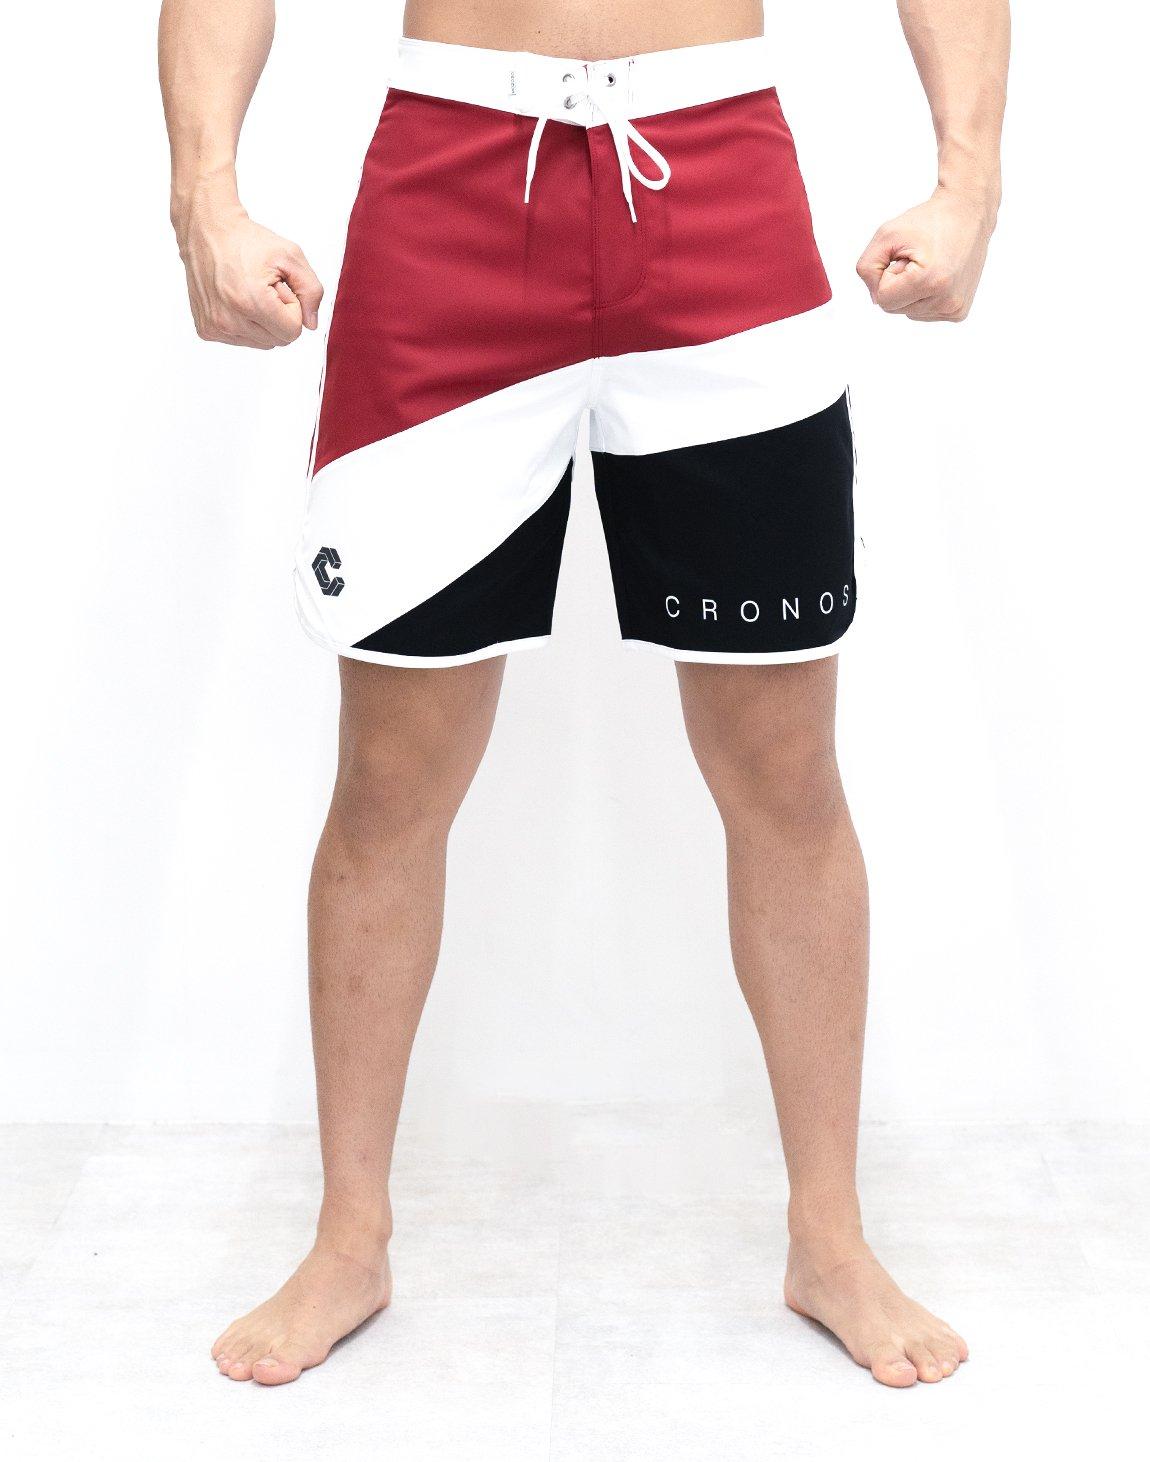 CRONOS THREE COLORS BOARD SHORTS【RED】